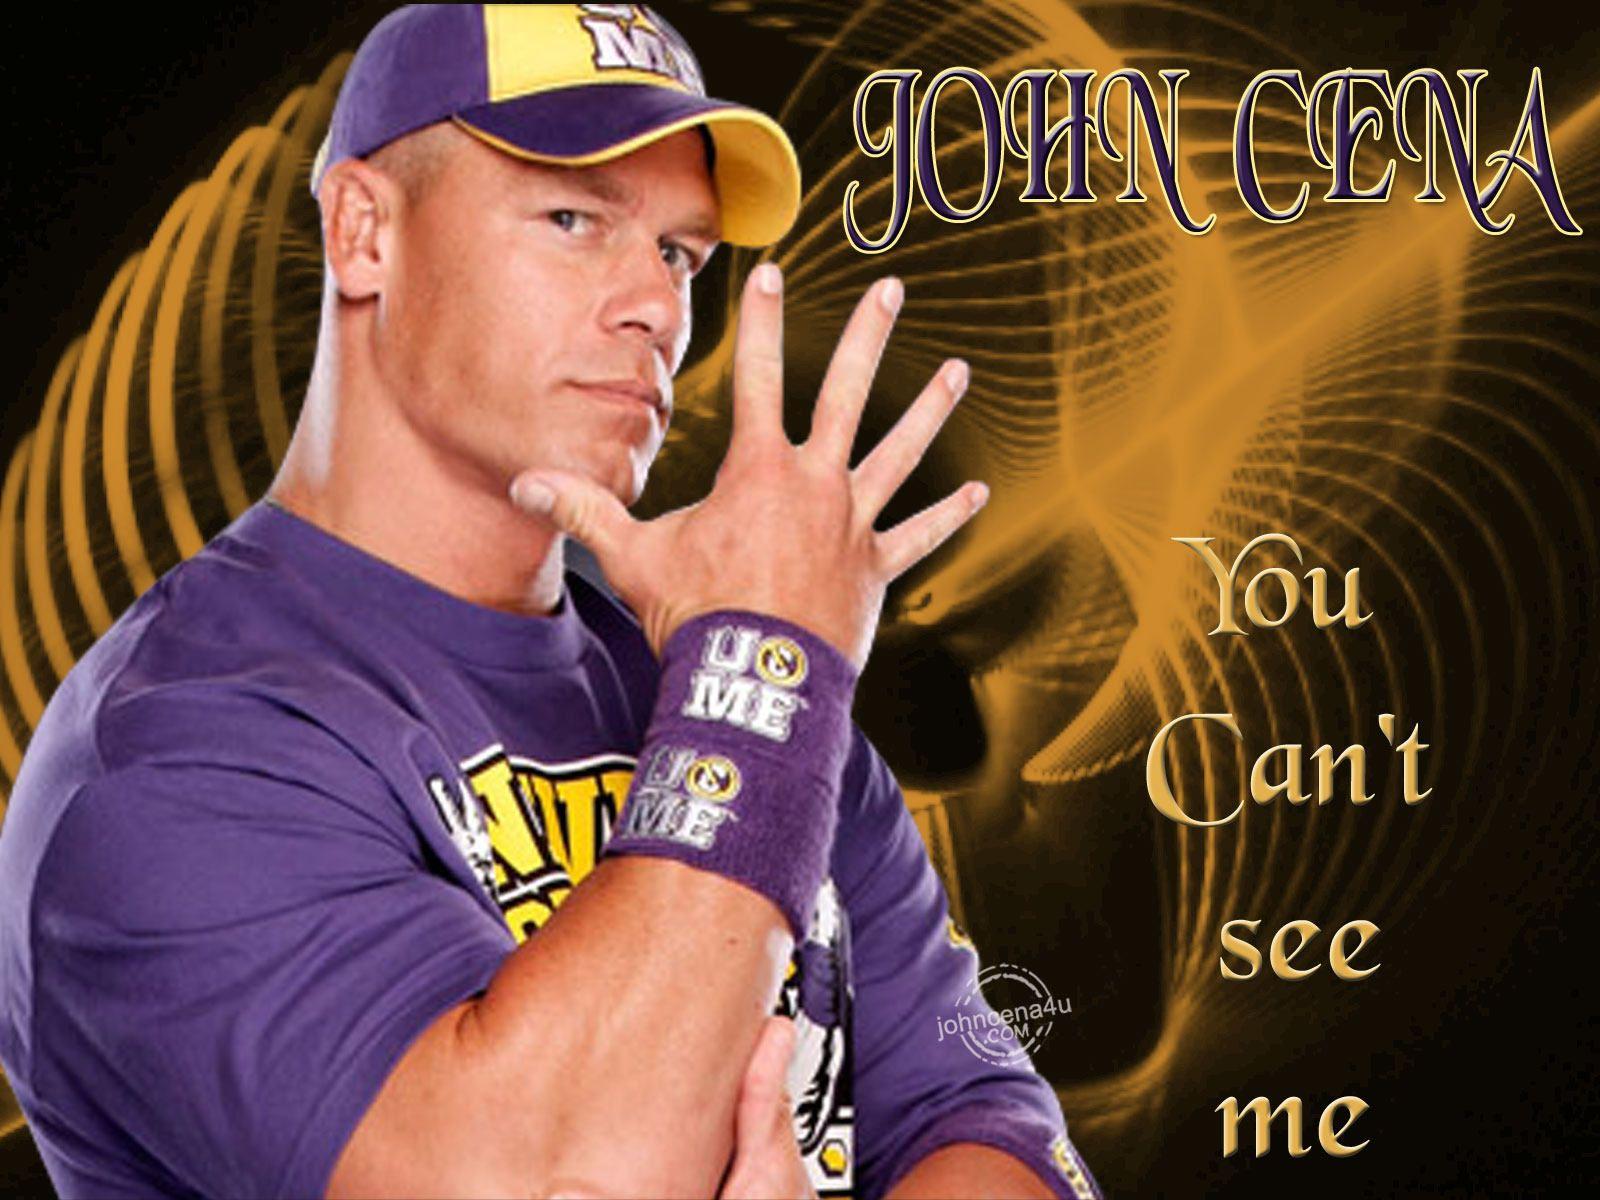 WWE John Cena wallpapers HD Download 1278720 John 1600x1200